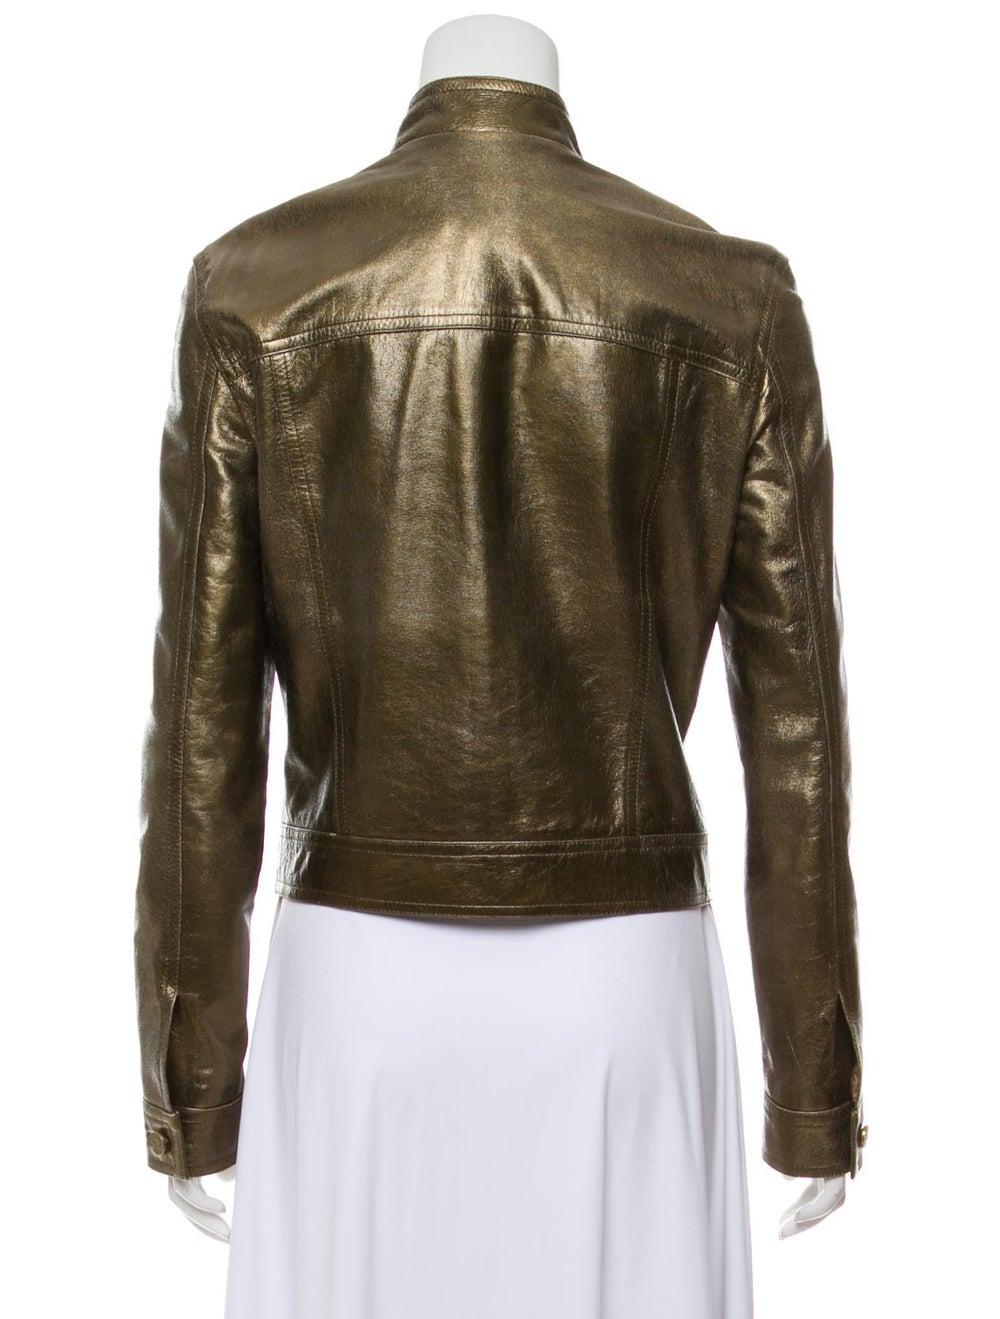 Celine Metallic Leather Jacket Gold - image 3